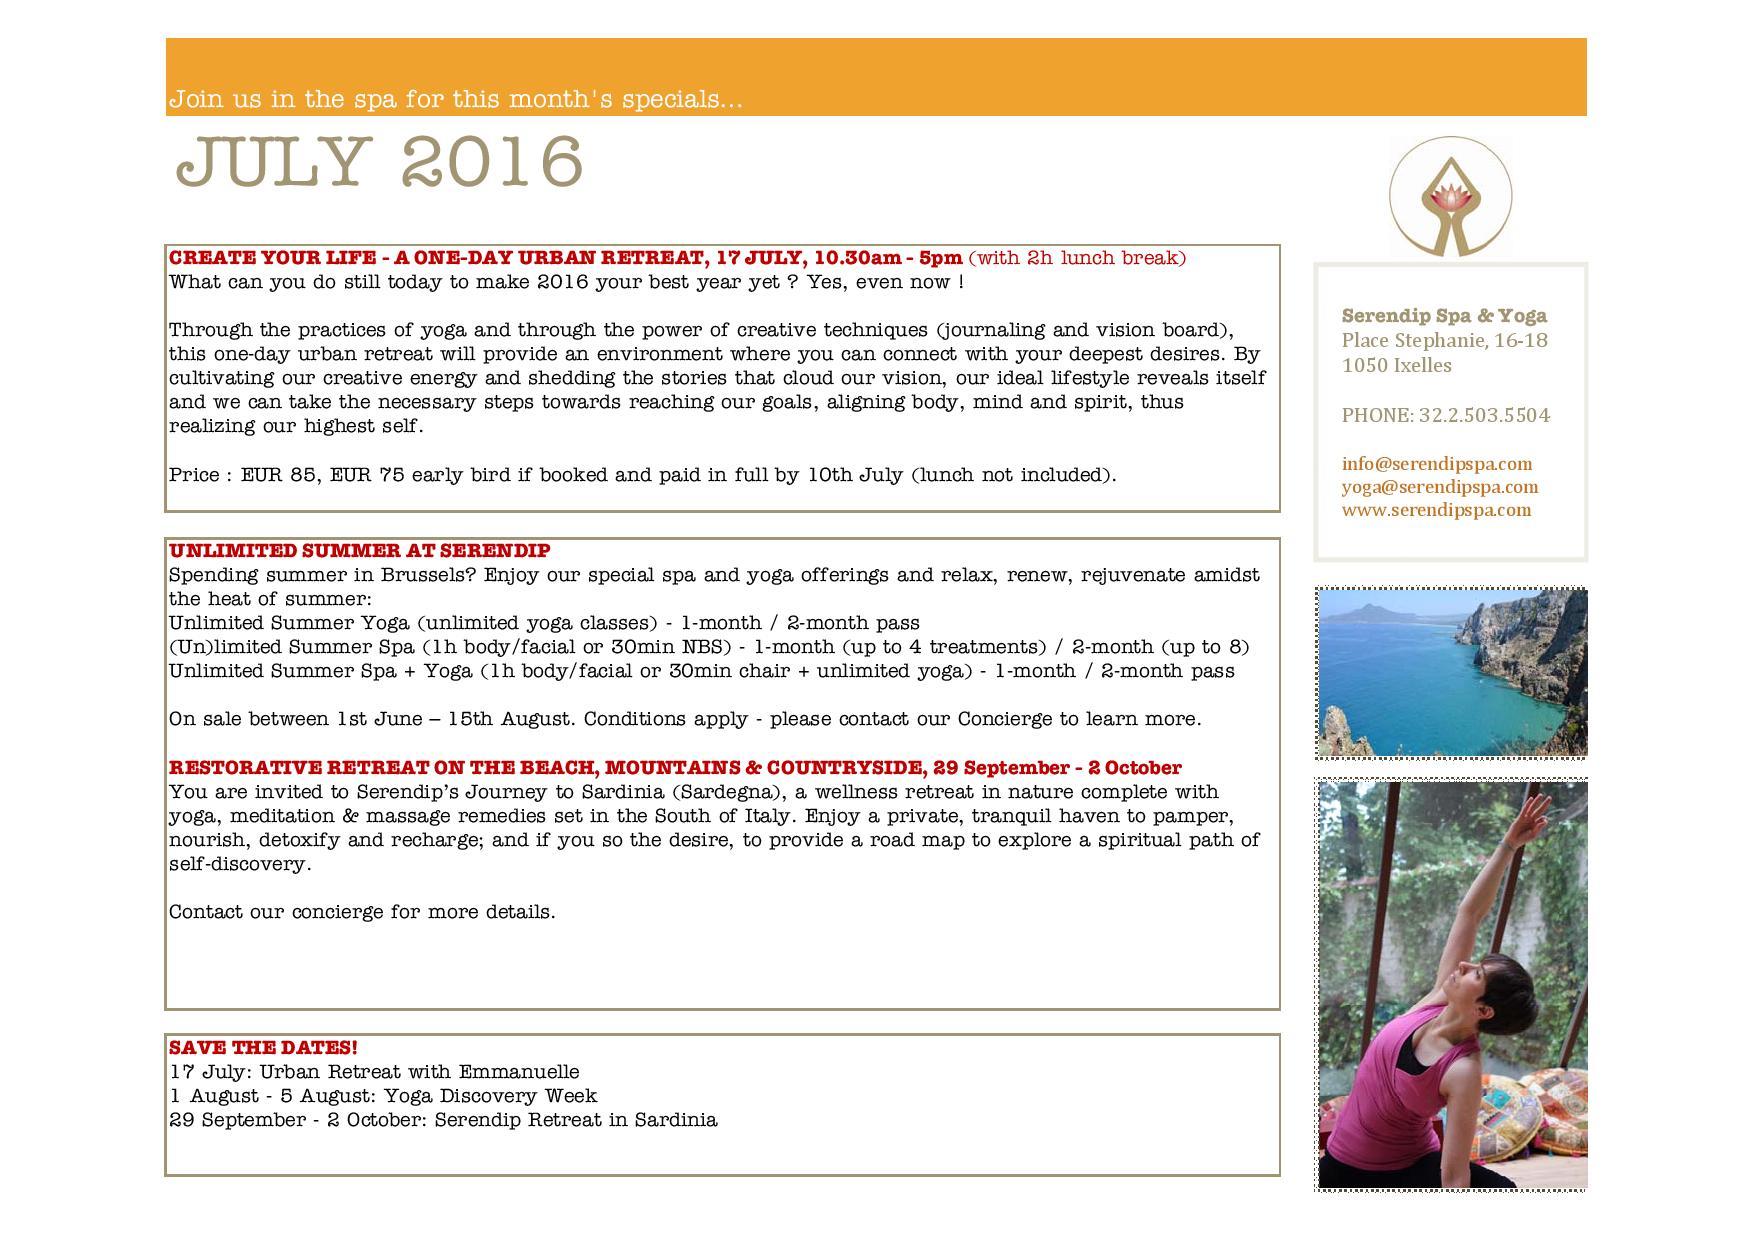 Serendip Spa and Yoga Calendar 2016_July BACK A4-page-001.jpg